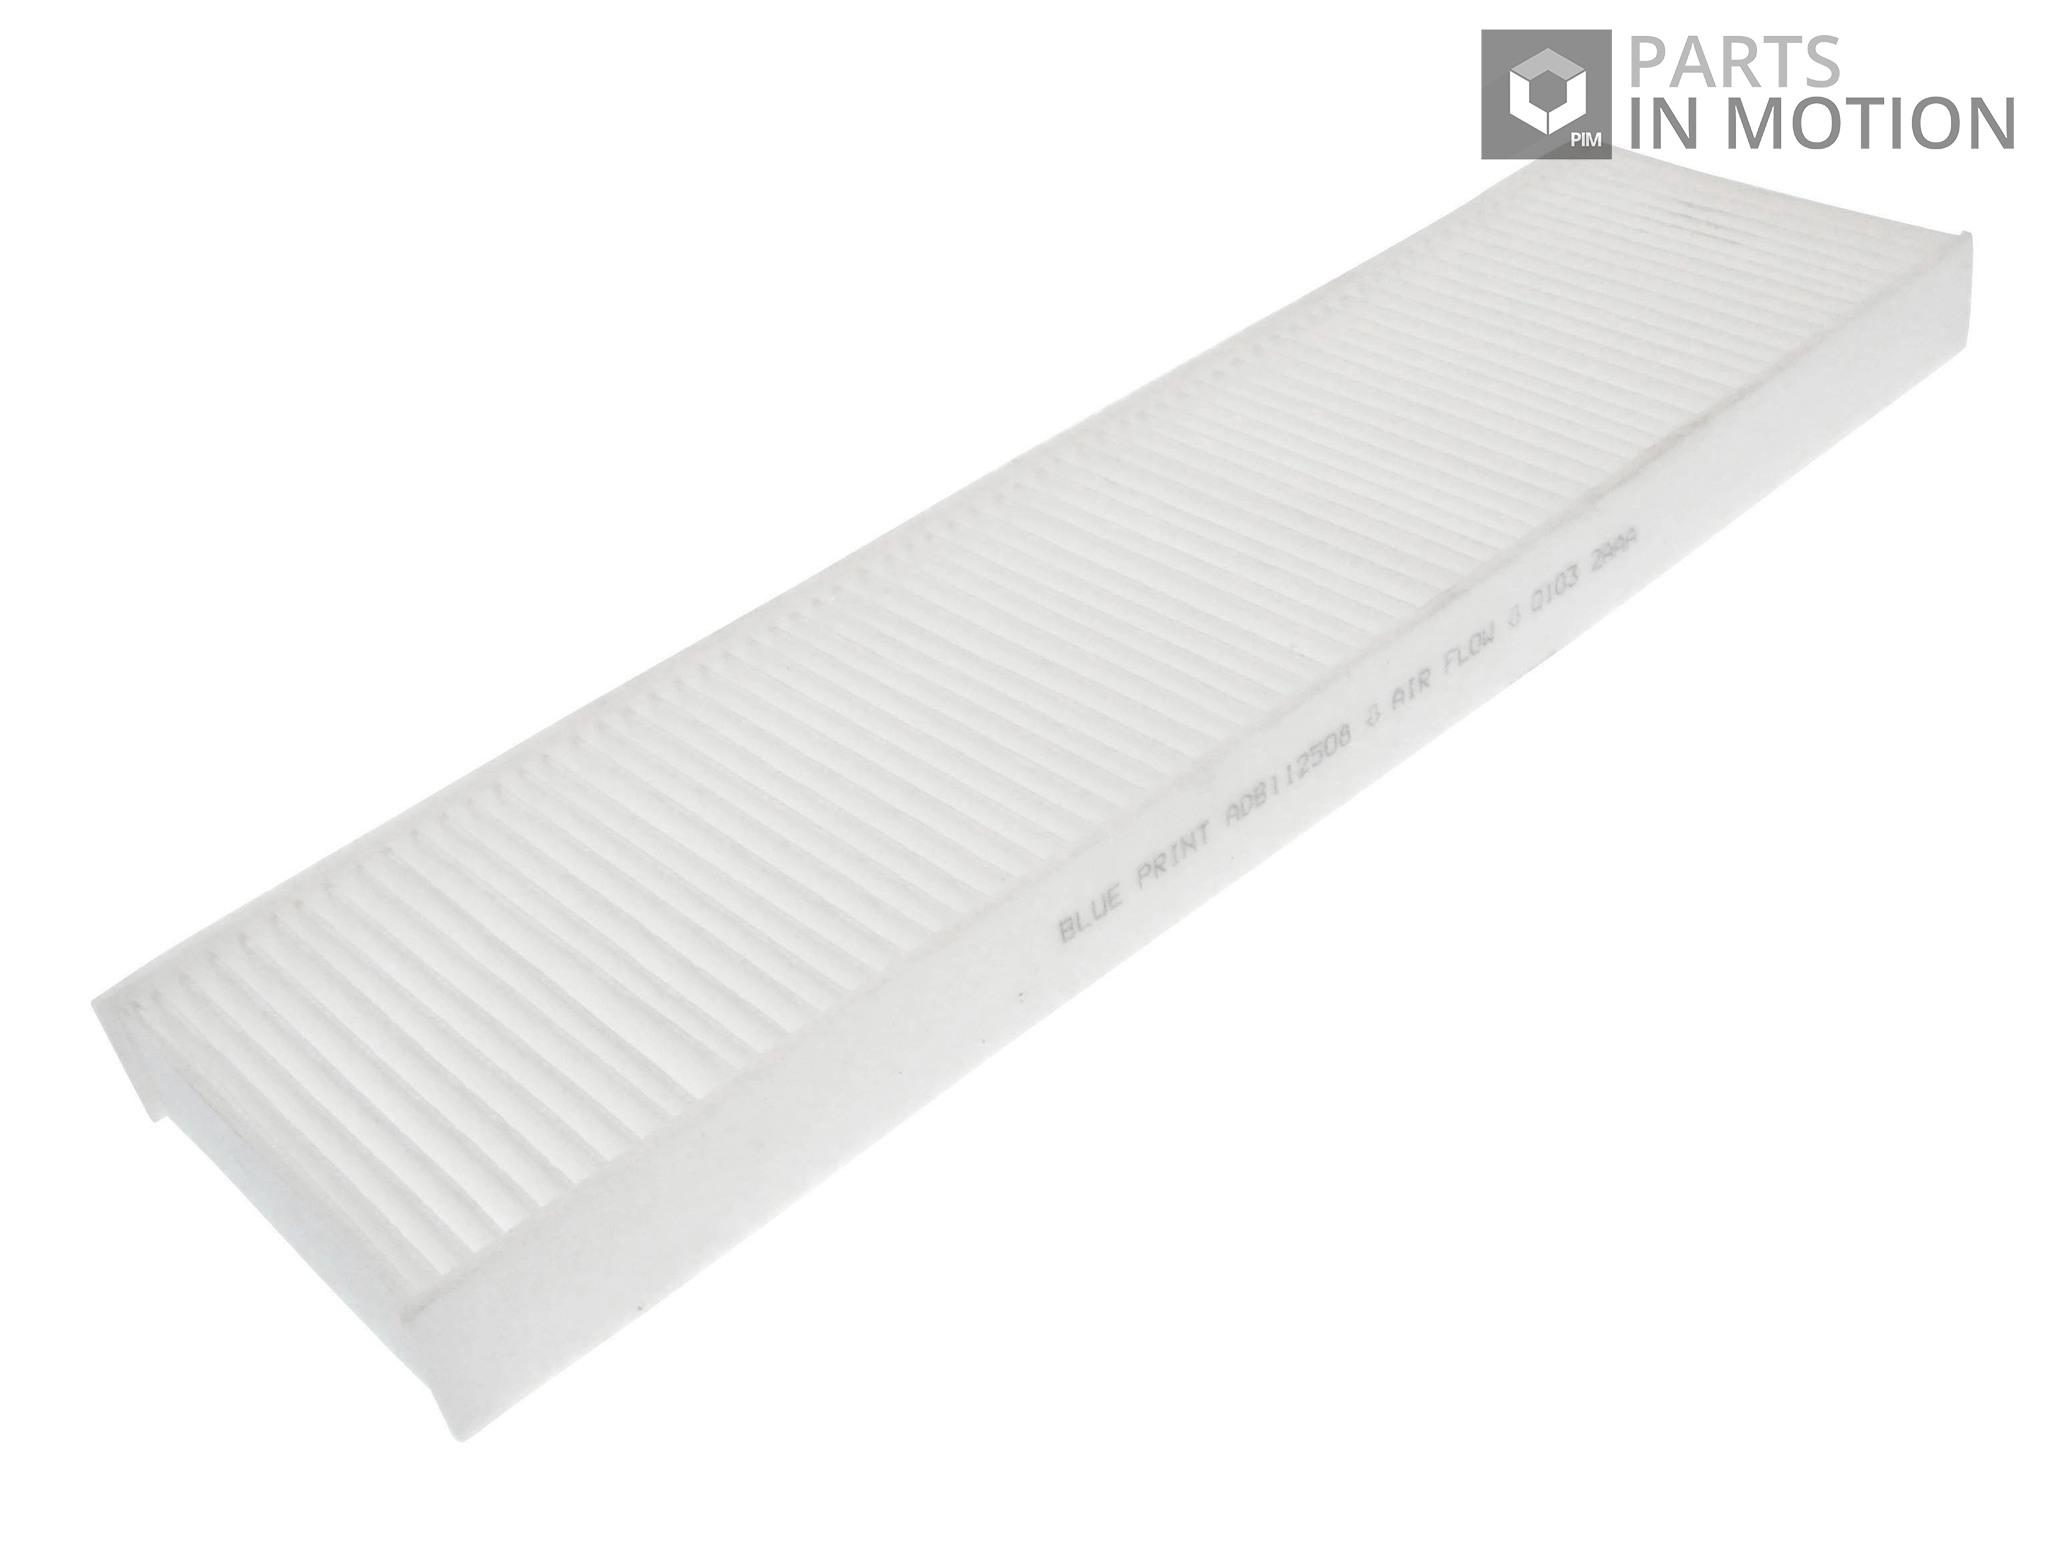 Topran filtro interior aire 501 653 filtros polen para mini Clubman r55 r56 r60